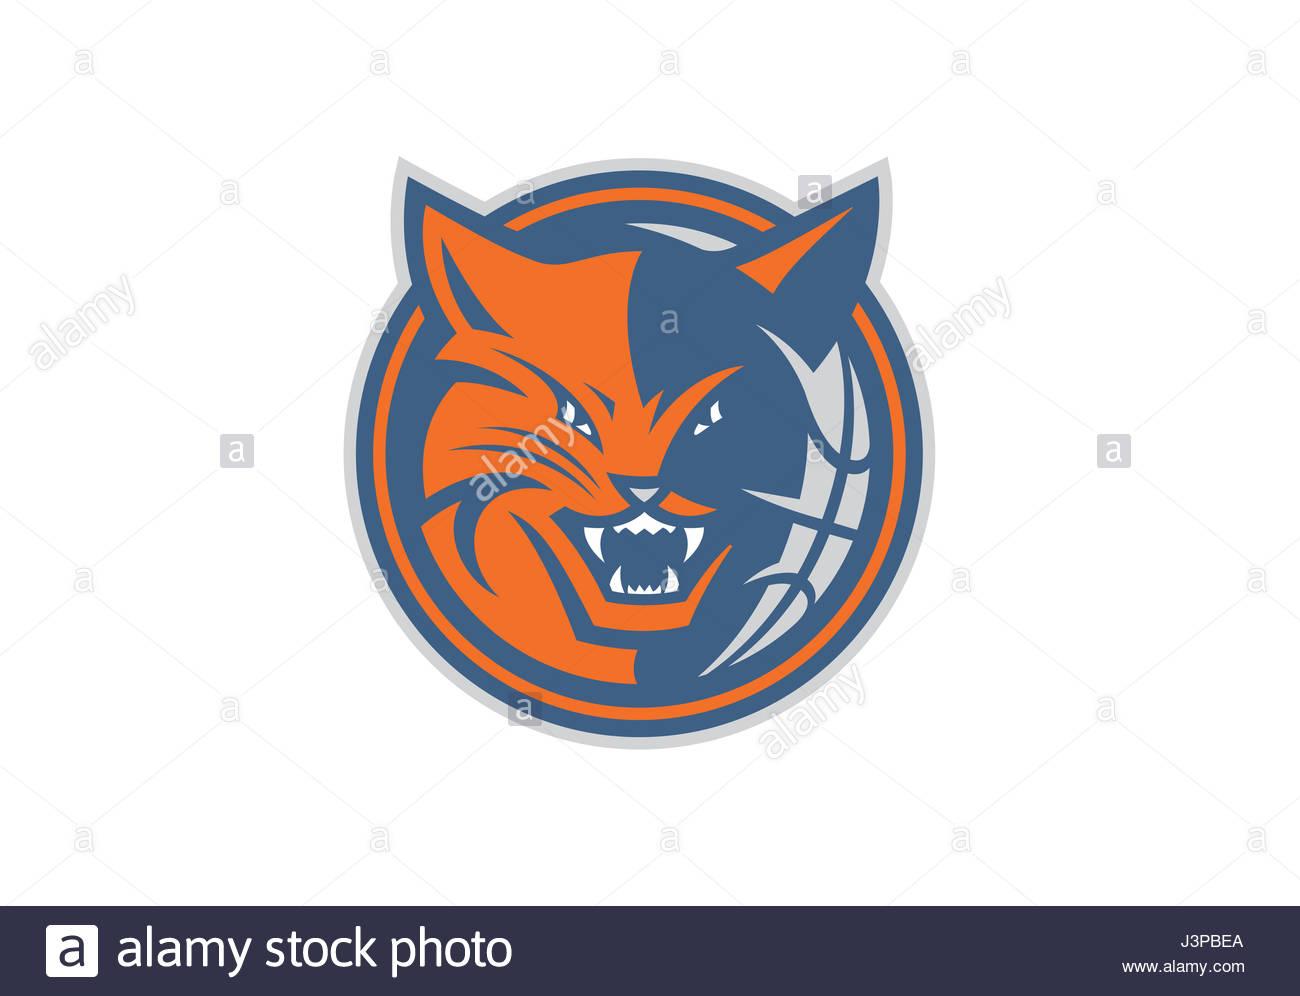 Charlotte Bobcats Nba Team Stock Photo 140018882 Alamy